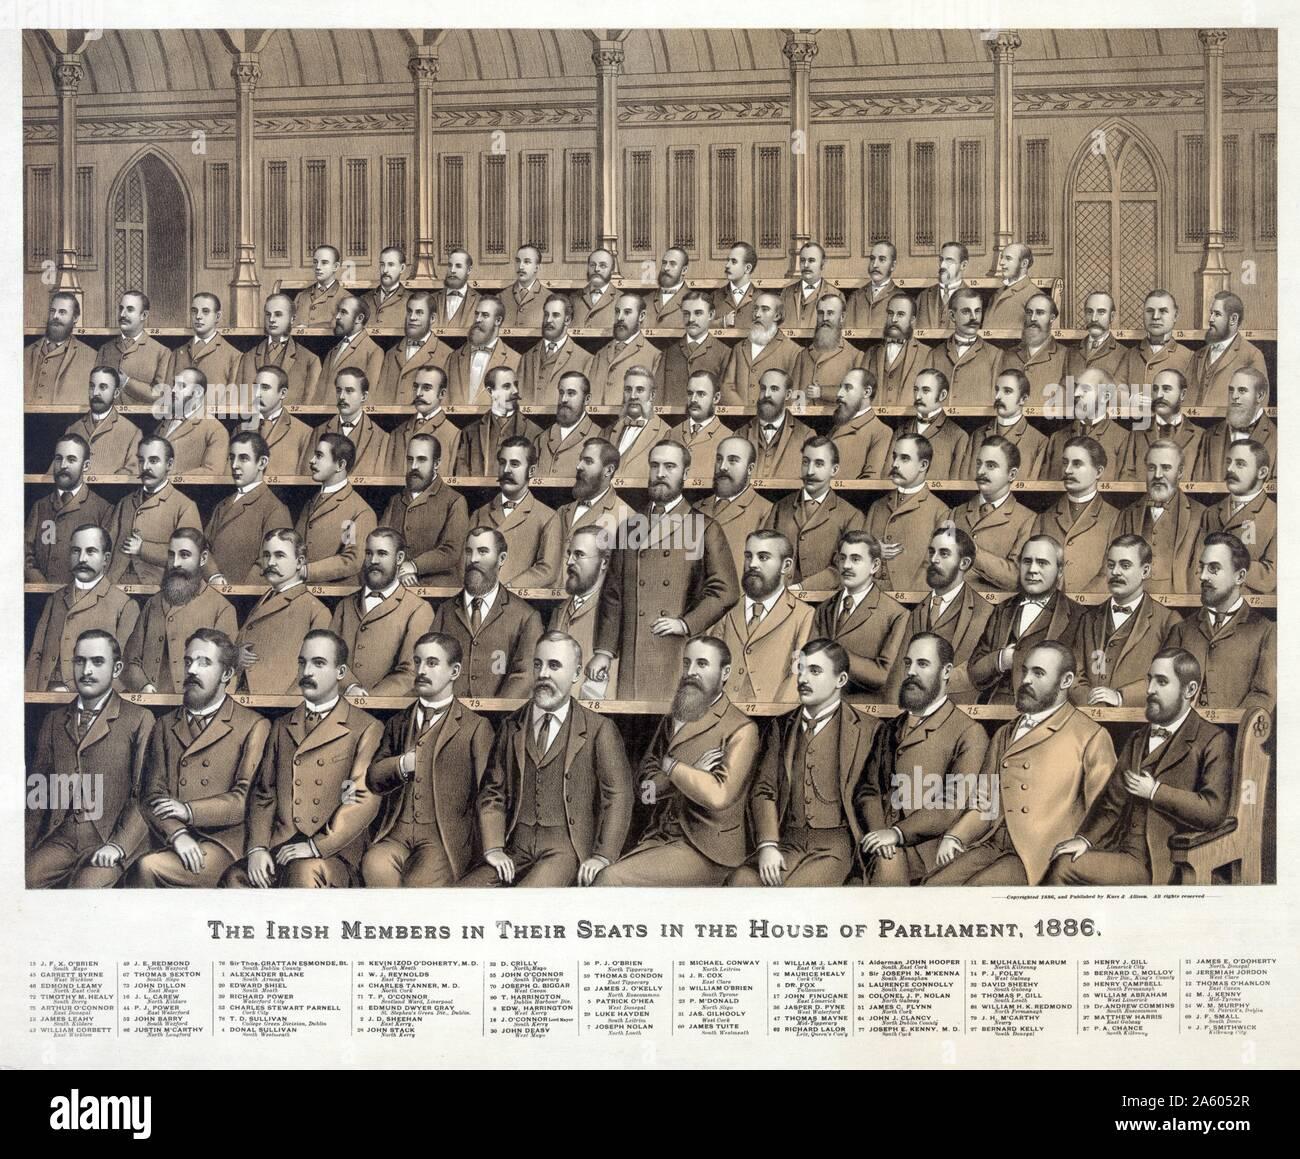 Diputados irlandeses en sus asientos en el Parlamento; 1886 de atrás hacia delante; 1. Alexander Blane; 2. J.D. Sheehan; 3. Sir Joseph N. M'Kenna; 4. Donal Sullivan; 5. Patrick O'Hea; 6. El Dr. Fox; 7. Joseph Nolan; 8. Edw. Harrington; 9. J.F. Smithwick; 10. William O'Brien; 11. E. Mulhallen Marum; 12. Thomas O'Hanlon; 13. James Leahy; 14. P.J. Foley; 15. J.F.X. O'Brien; 16. J.L. Carew; 17. John Finucane; 18. J. O'Connor; señor alcalde; 19. El Dr. Andrew Commins; 20. Edward Shiel; 21. James E. O'Doherty; 22. Michael Conway; 23. P. M'DDonald; 24. Laurence Connolly; 25. Henry J. Gill; 26. Kevin Izod O'Doher Foto de stock